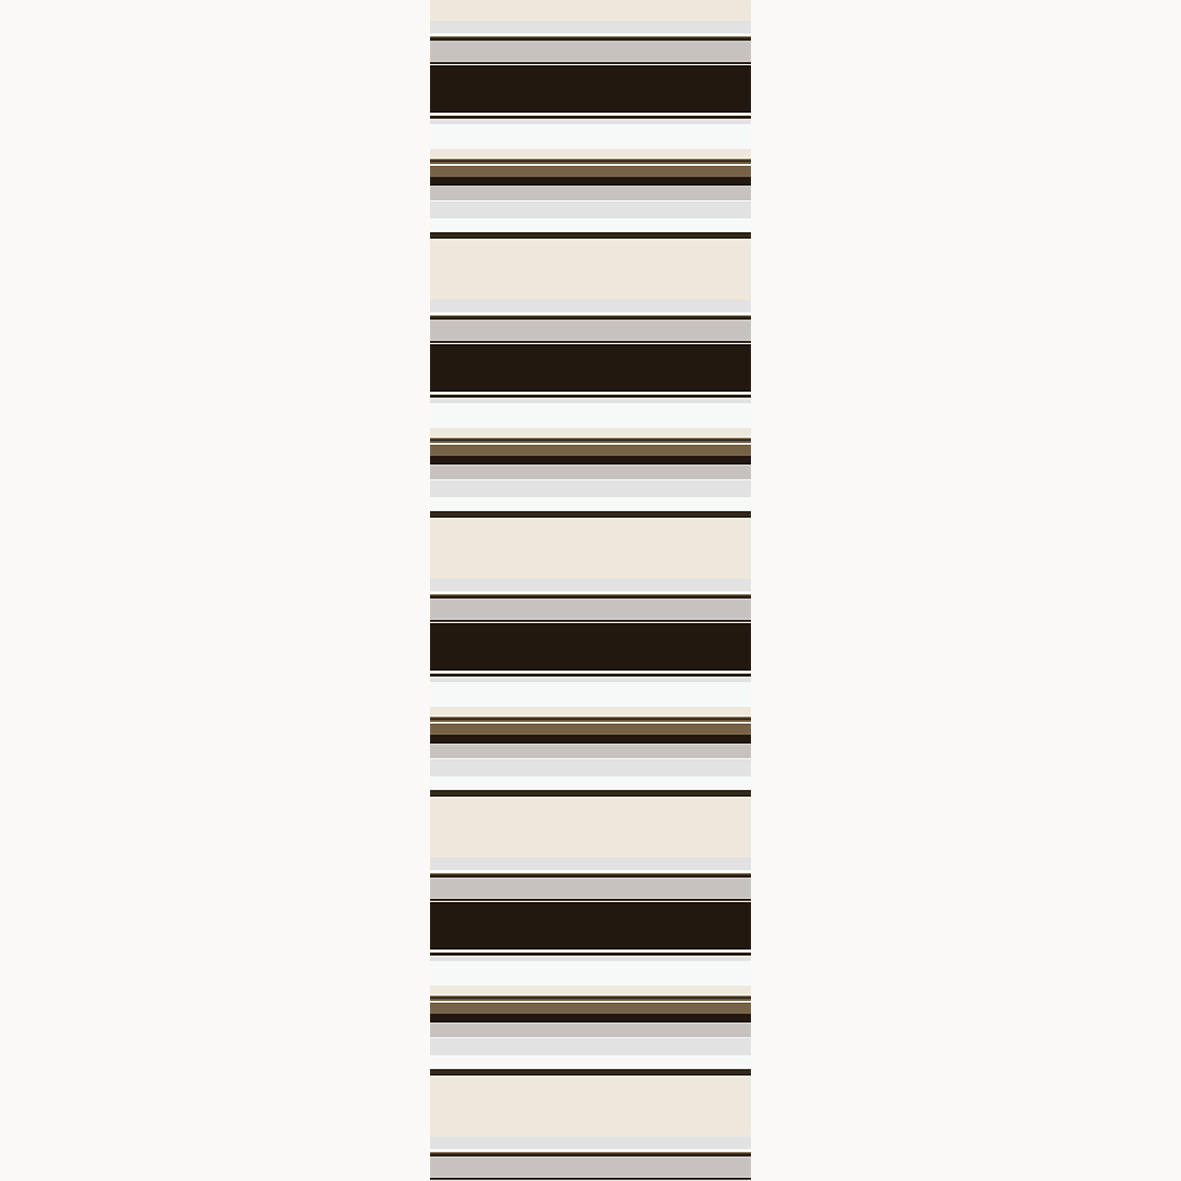 Passadeira Rayas Classic - 66 x 240 cm